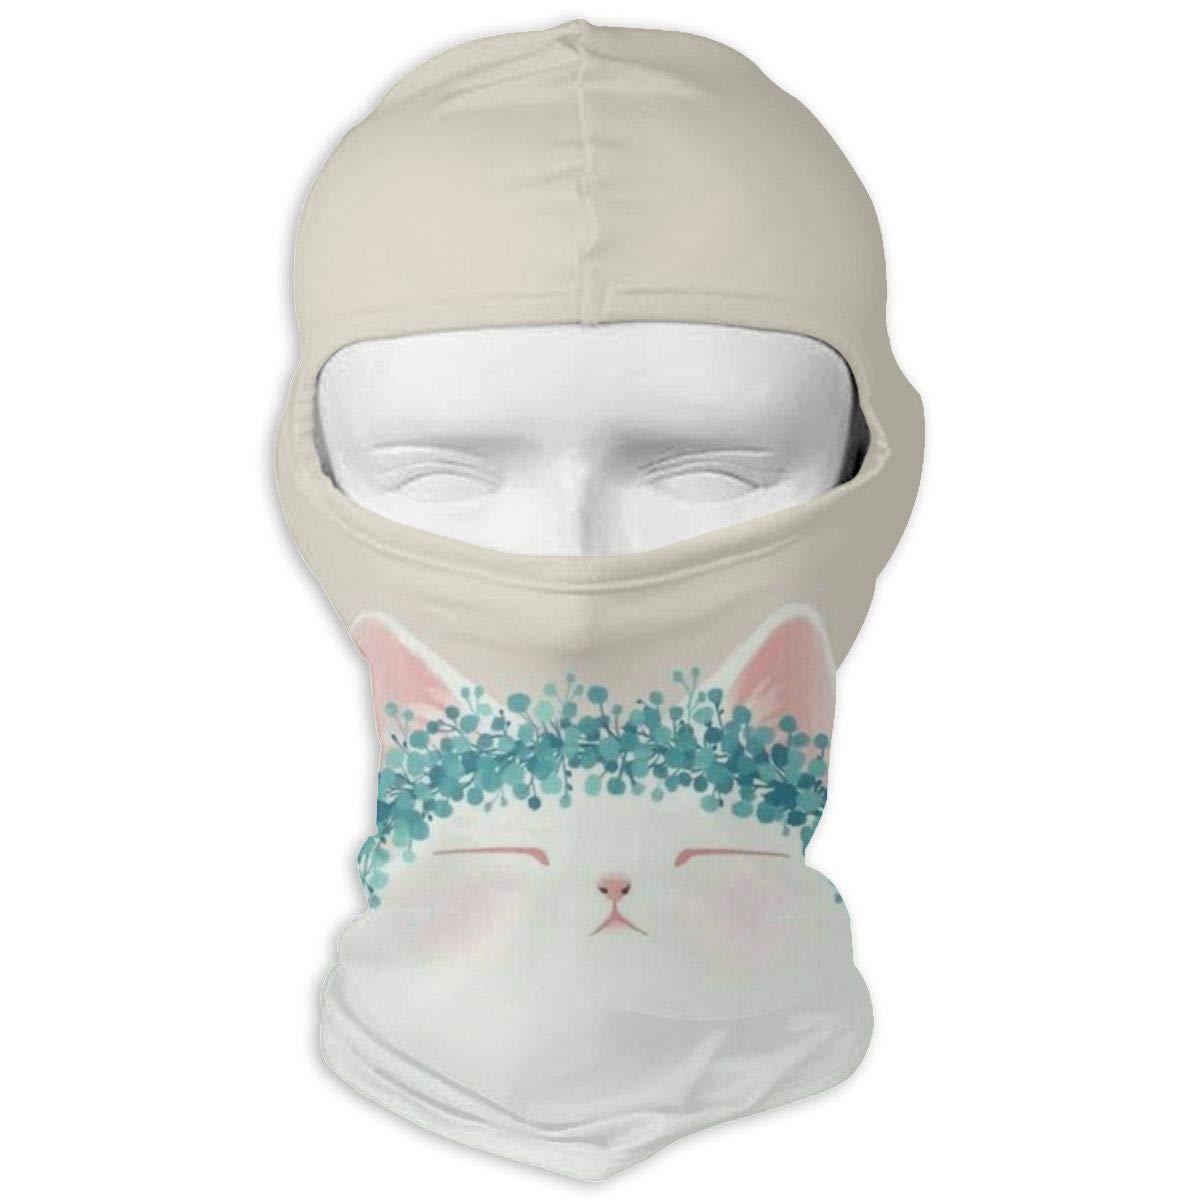 Gomop Ski Cap Lovely Cat Full Face Mask Wind-Resistant Face Mask